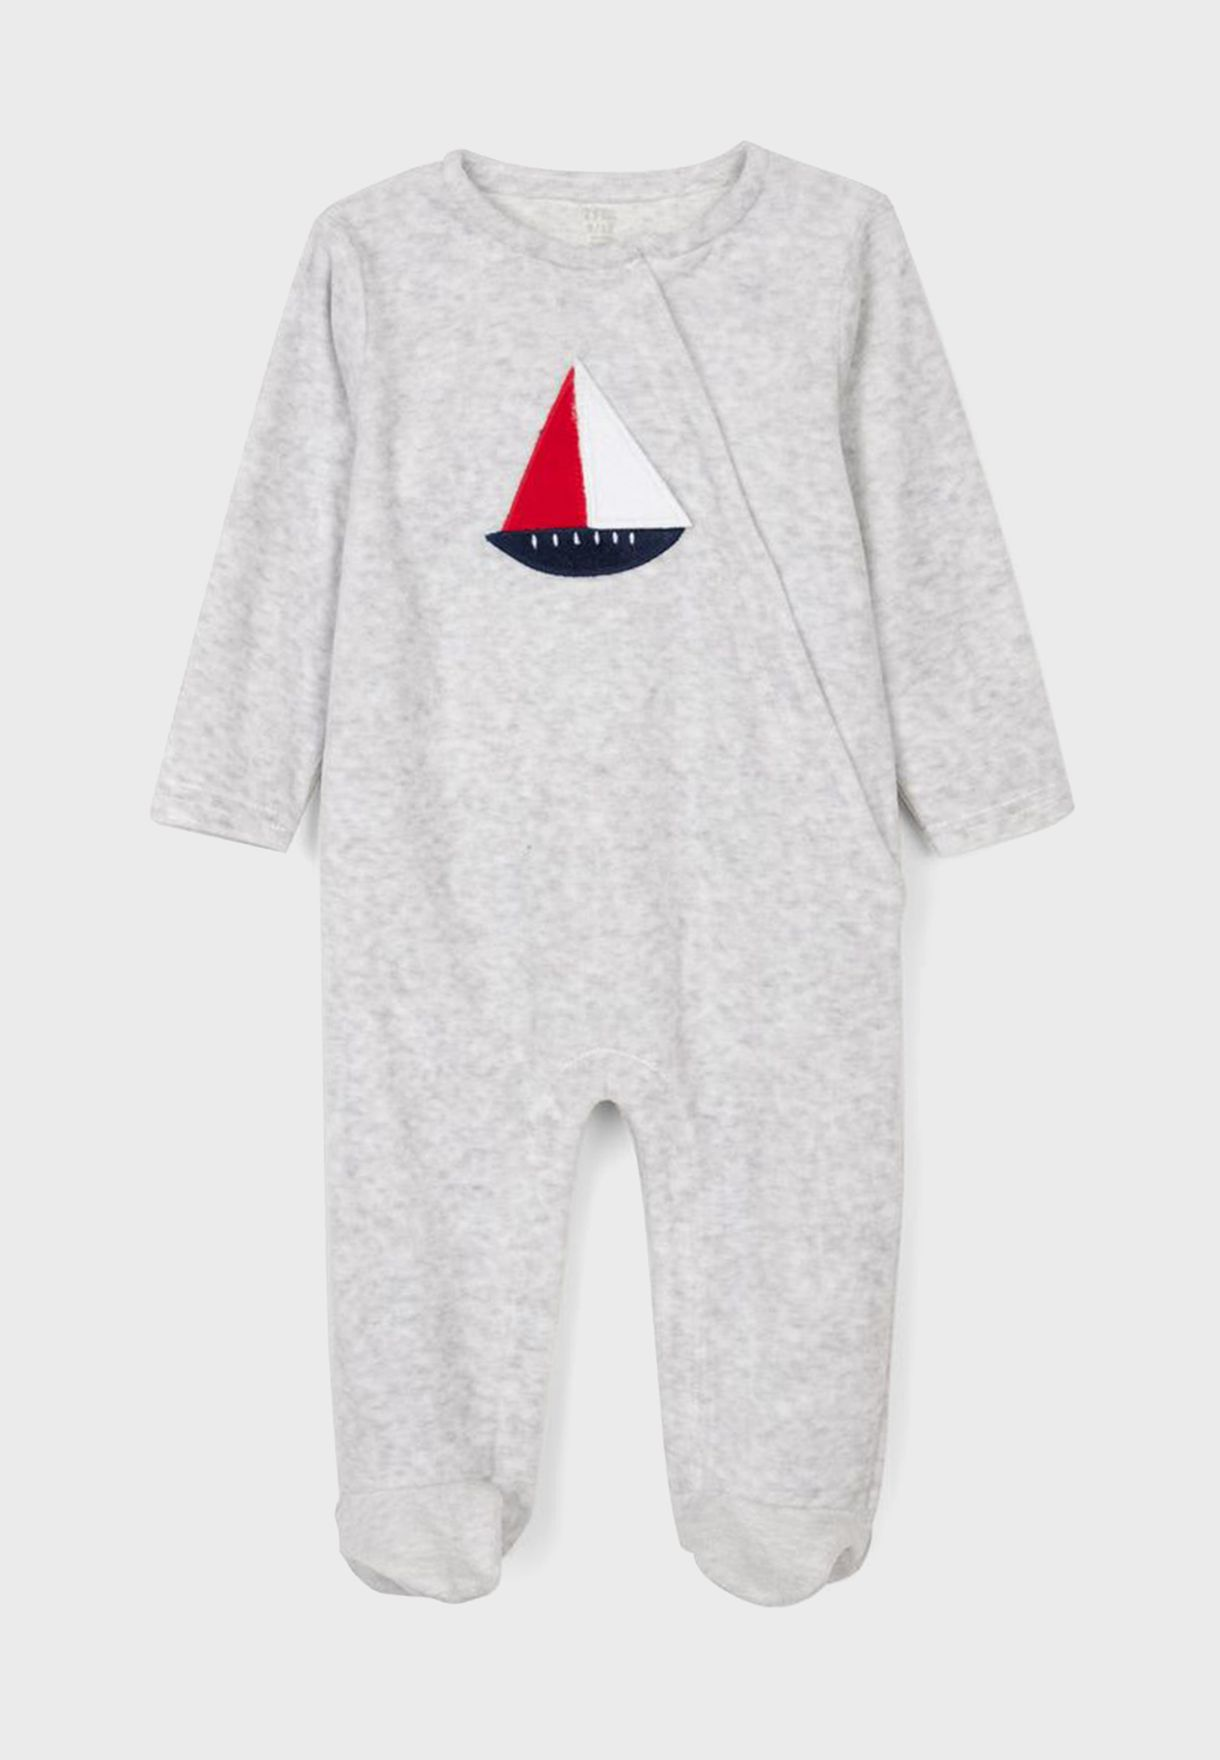 Infant Boat Print Onesie